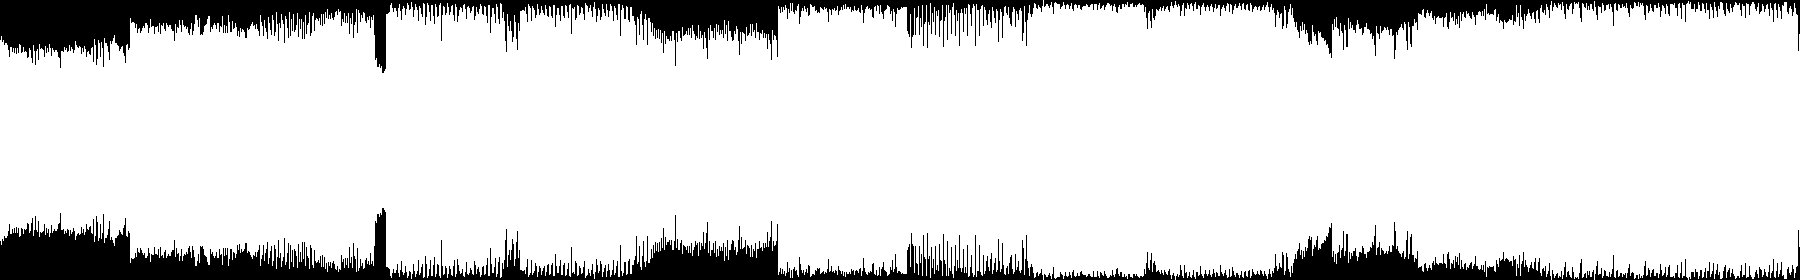 EDM 2017 audio waveform